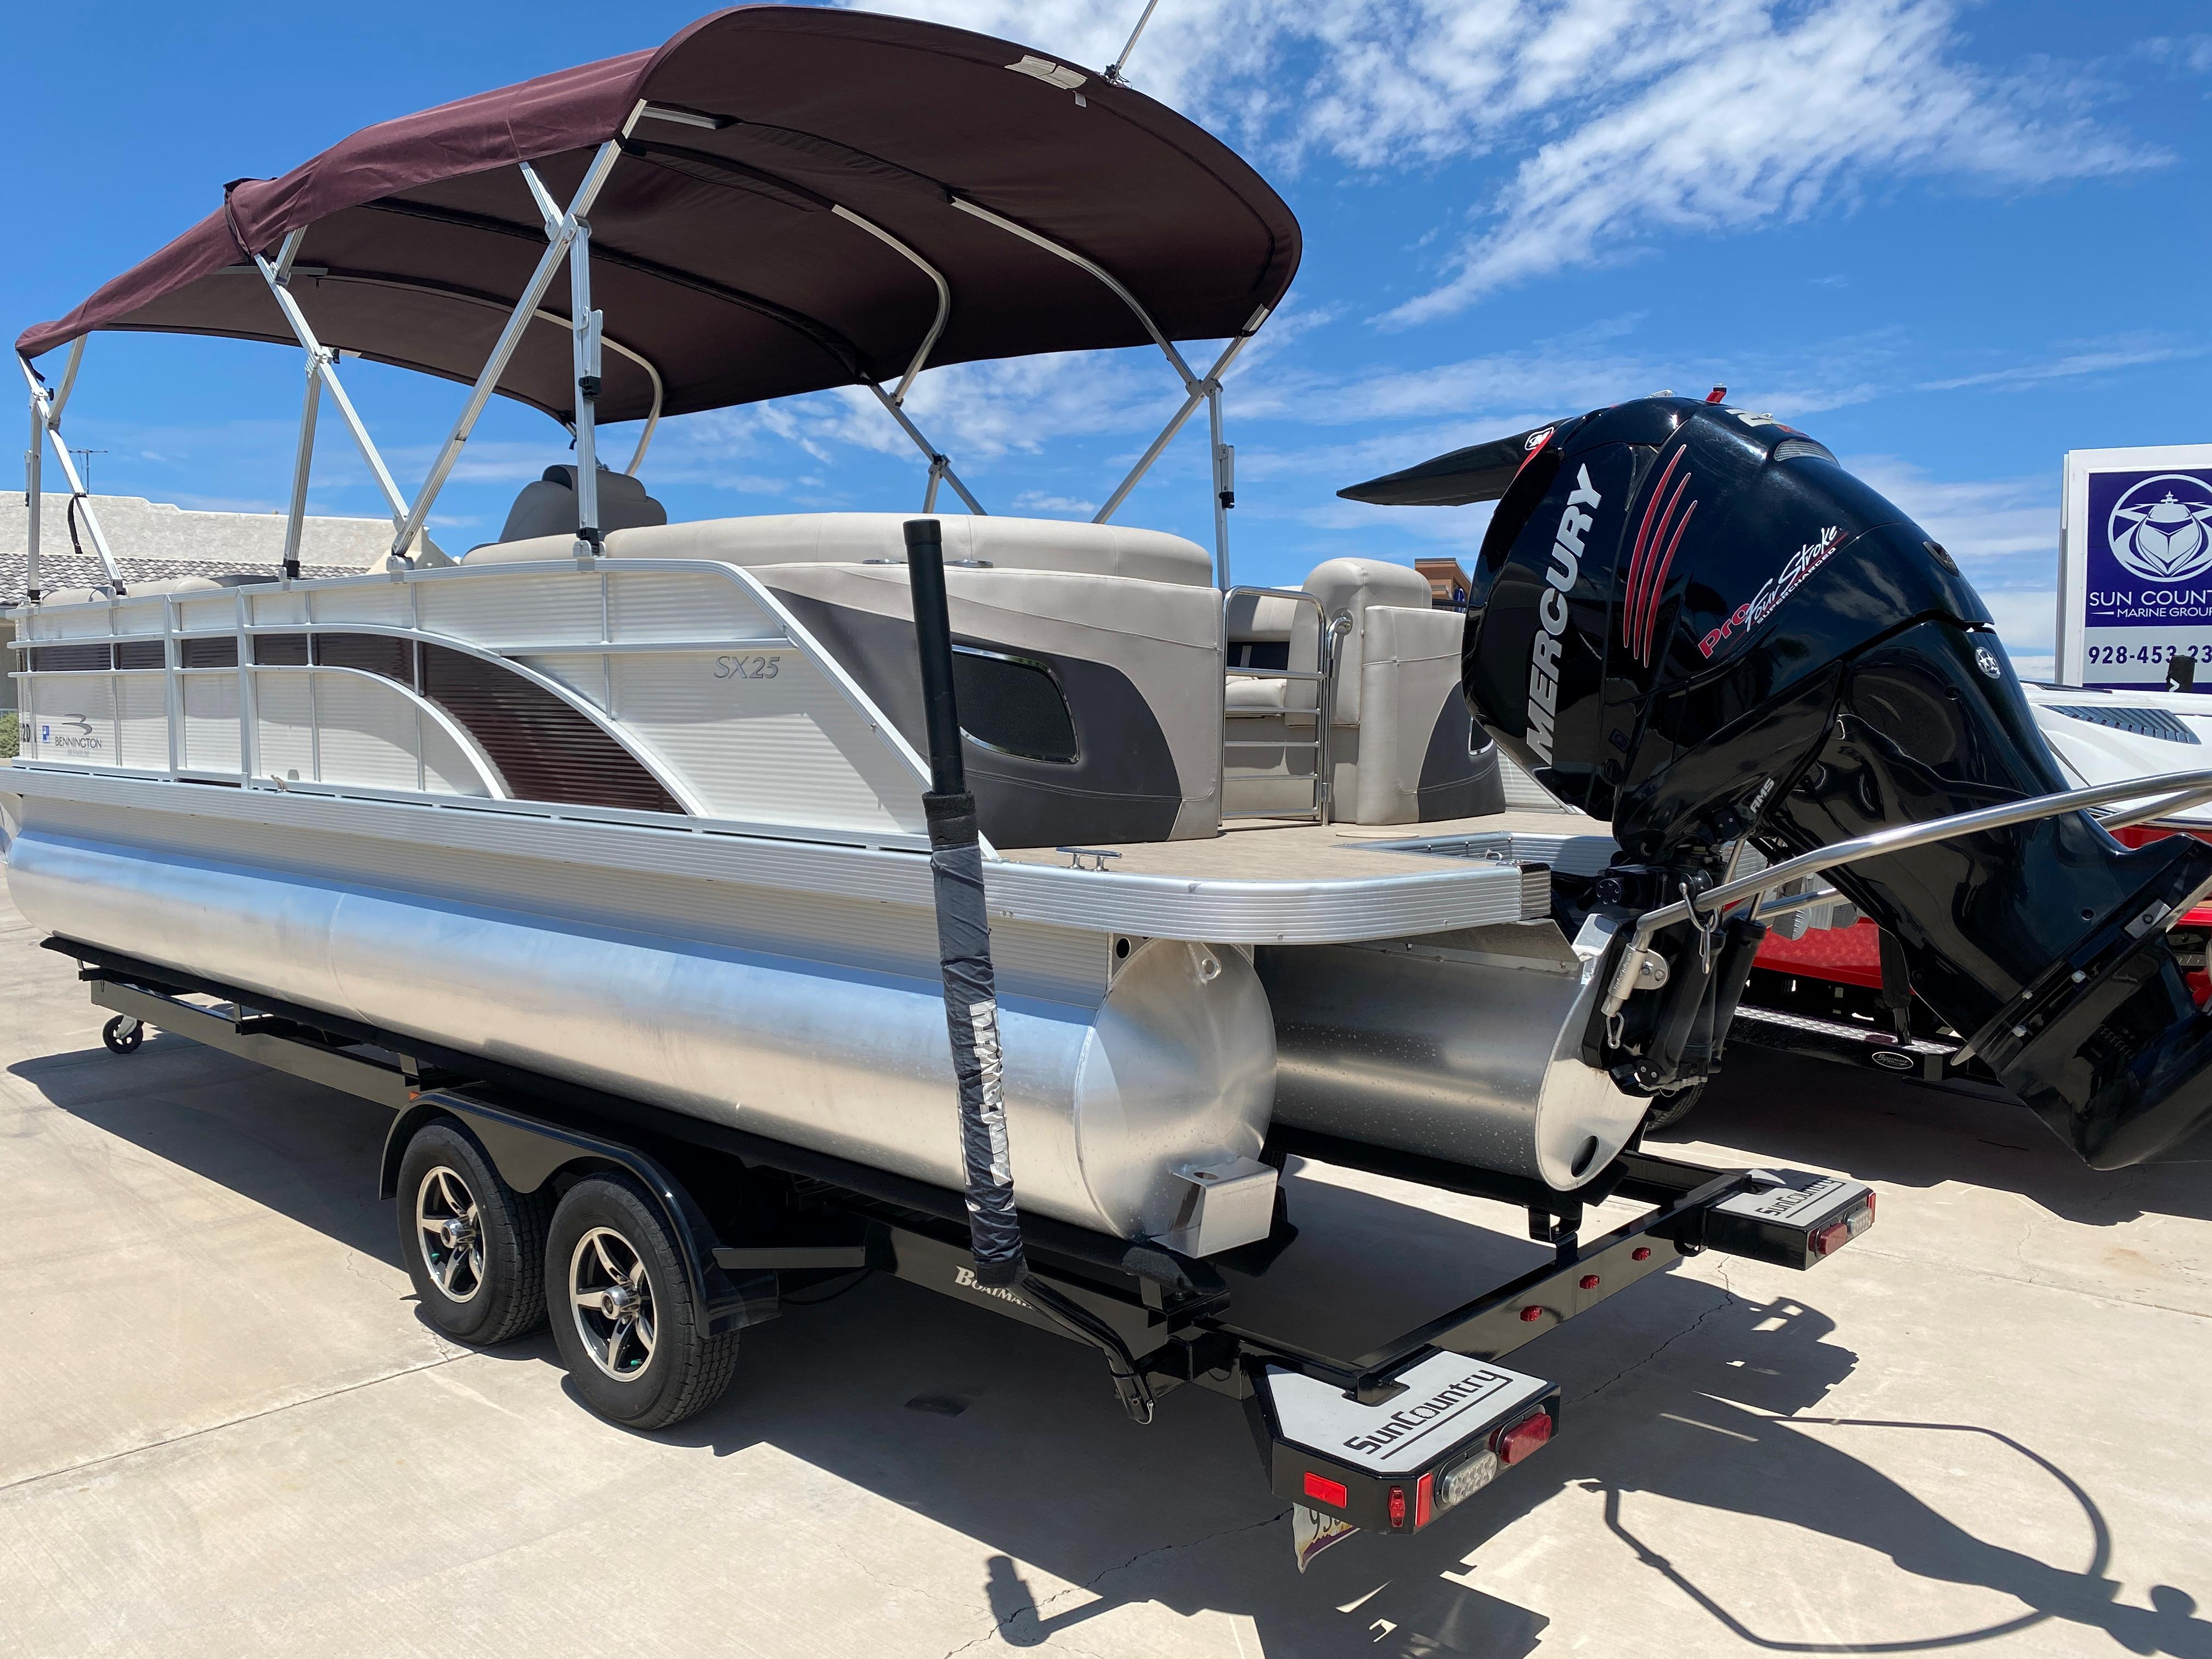 2018 Bennington 25 SX #TB3053JC inventory image at Sun Country Inland in Lake Havasu City